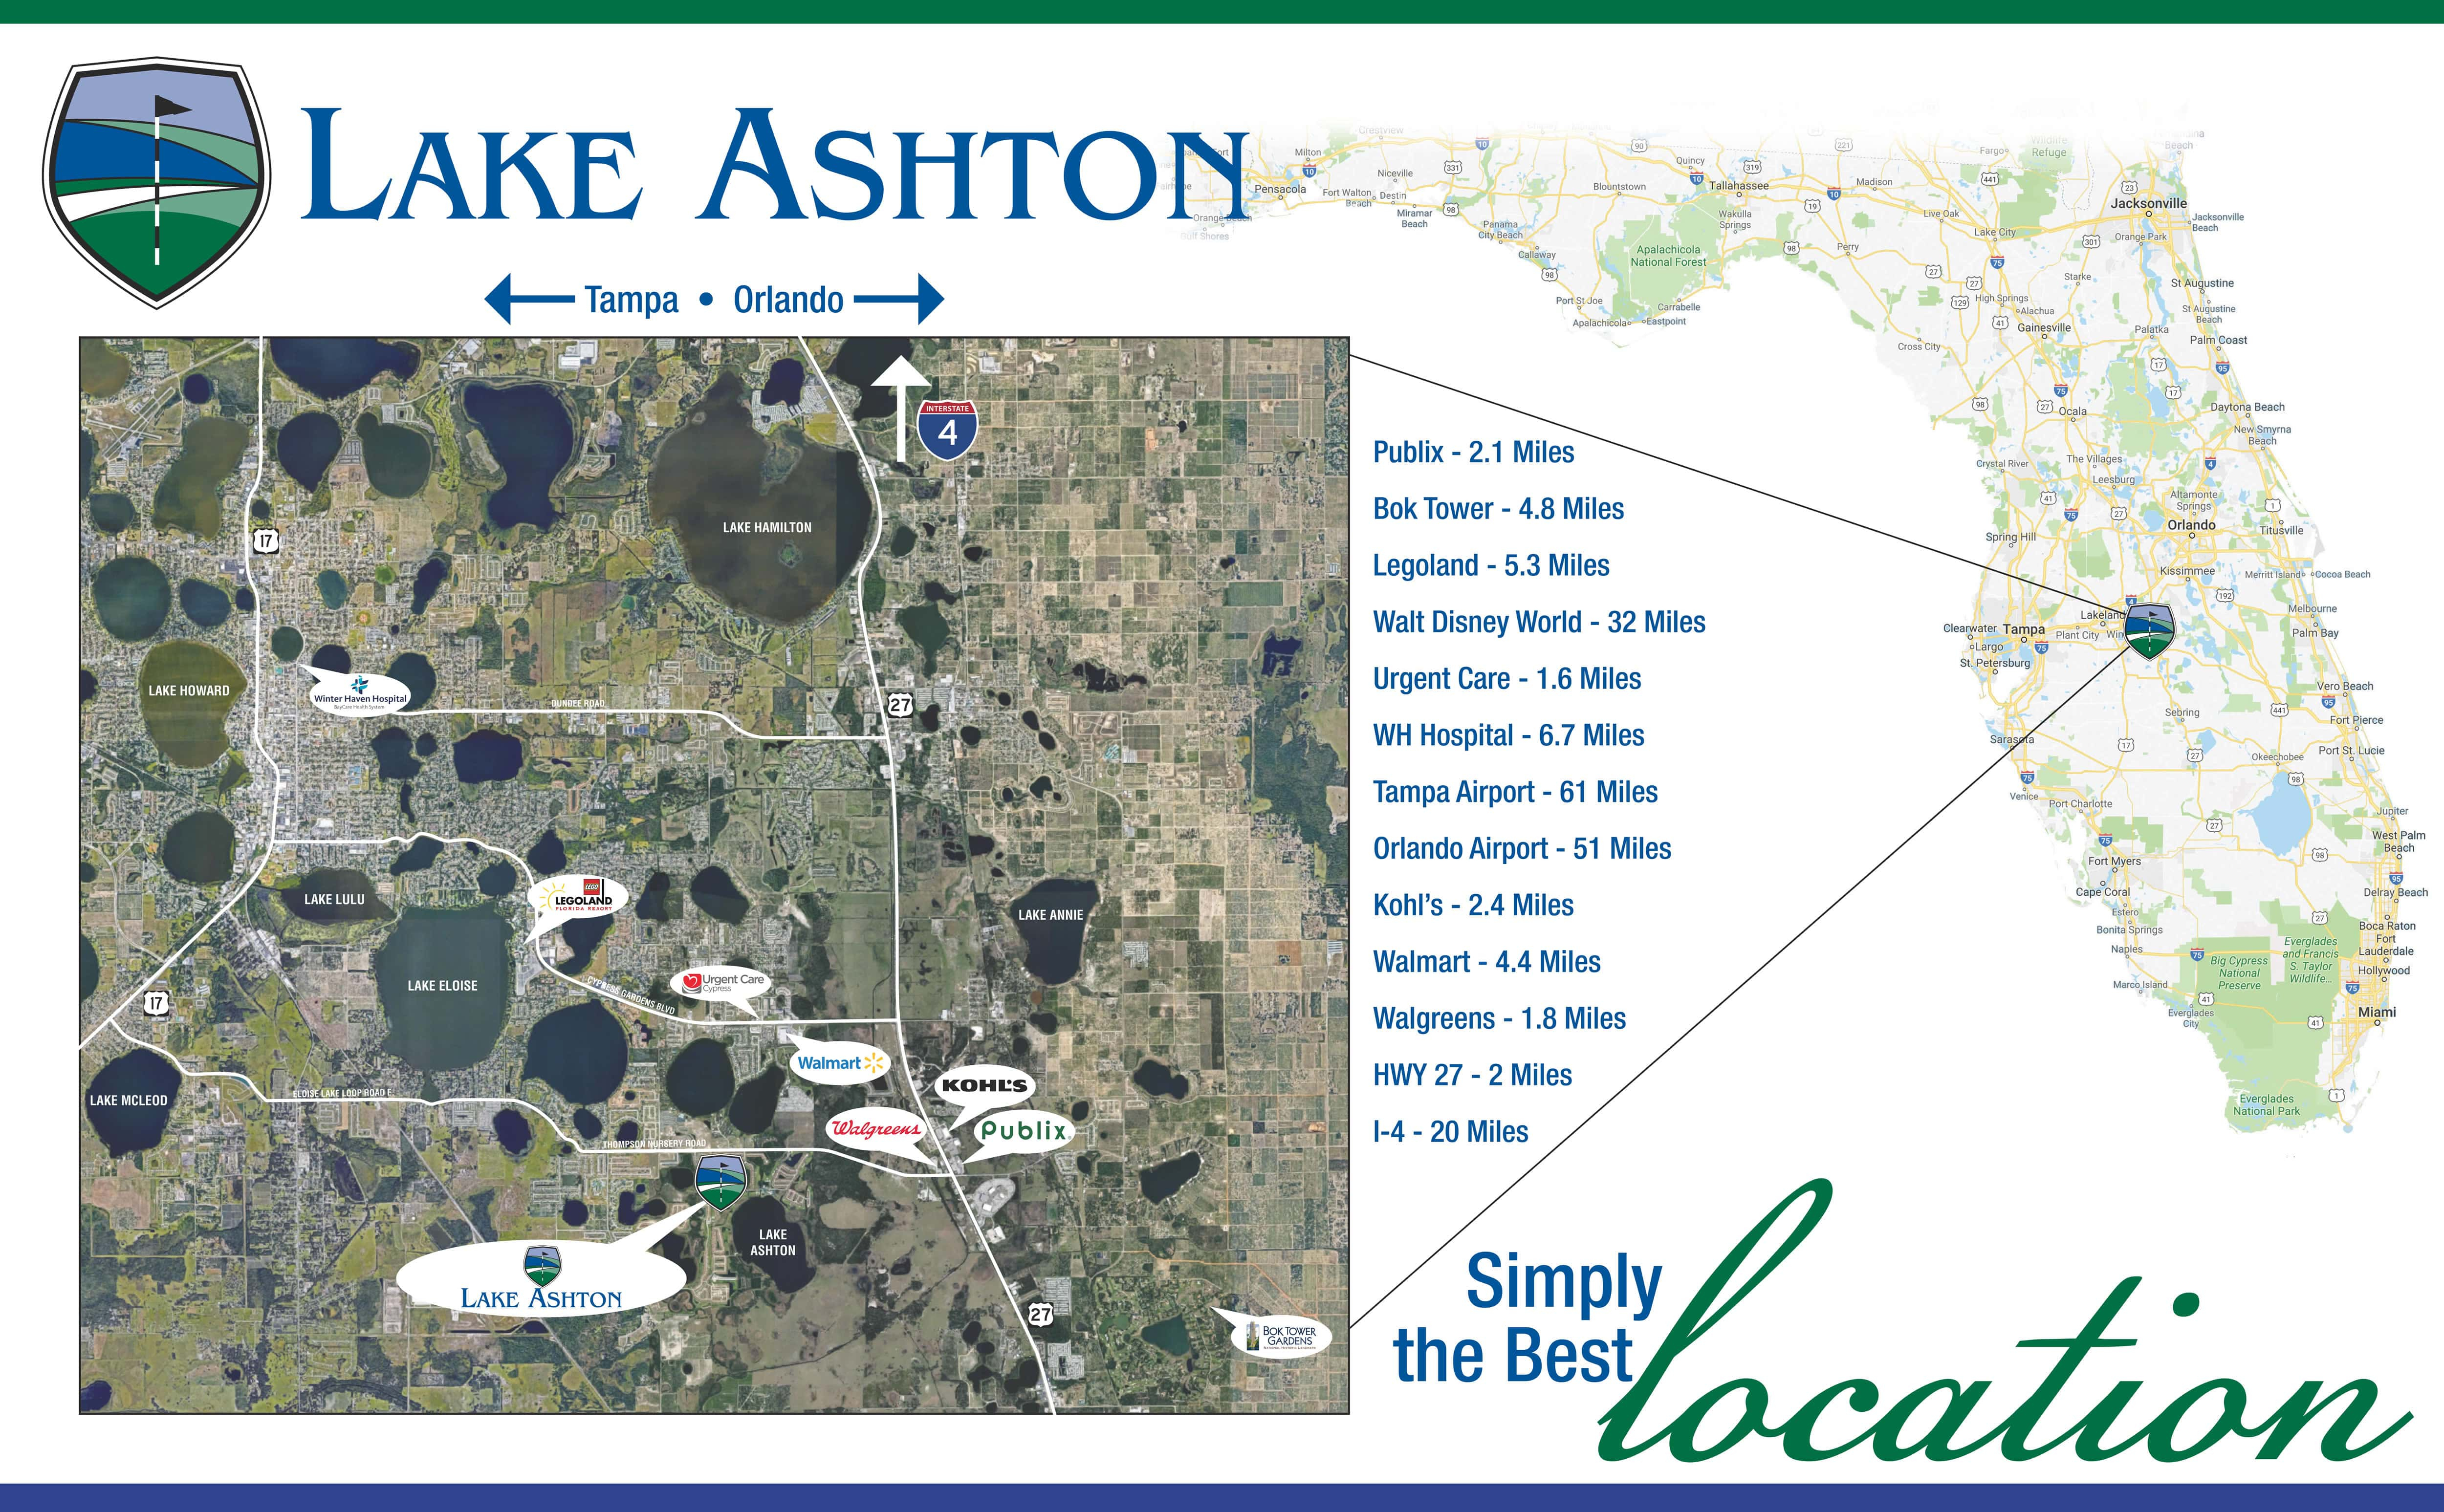 Central Florida Retirement Community - Fun & Active 55+ Retirement - Lake Wales Florida Map